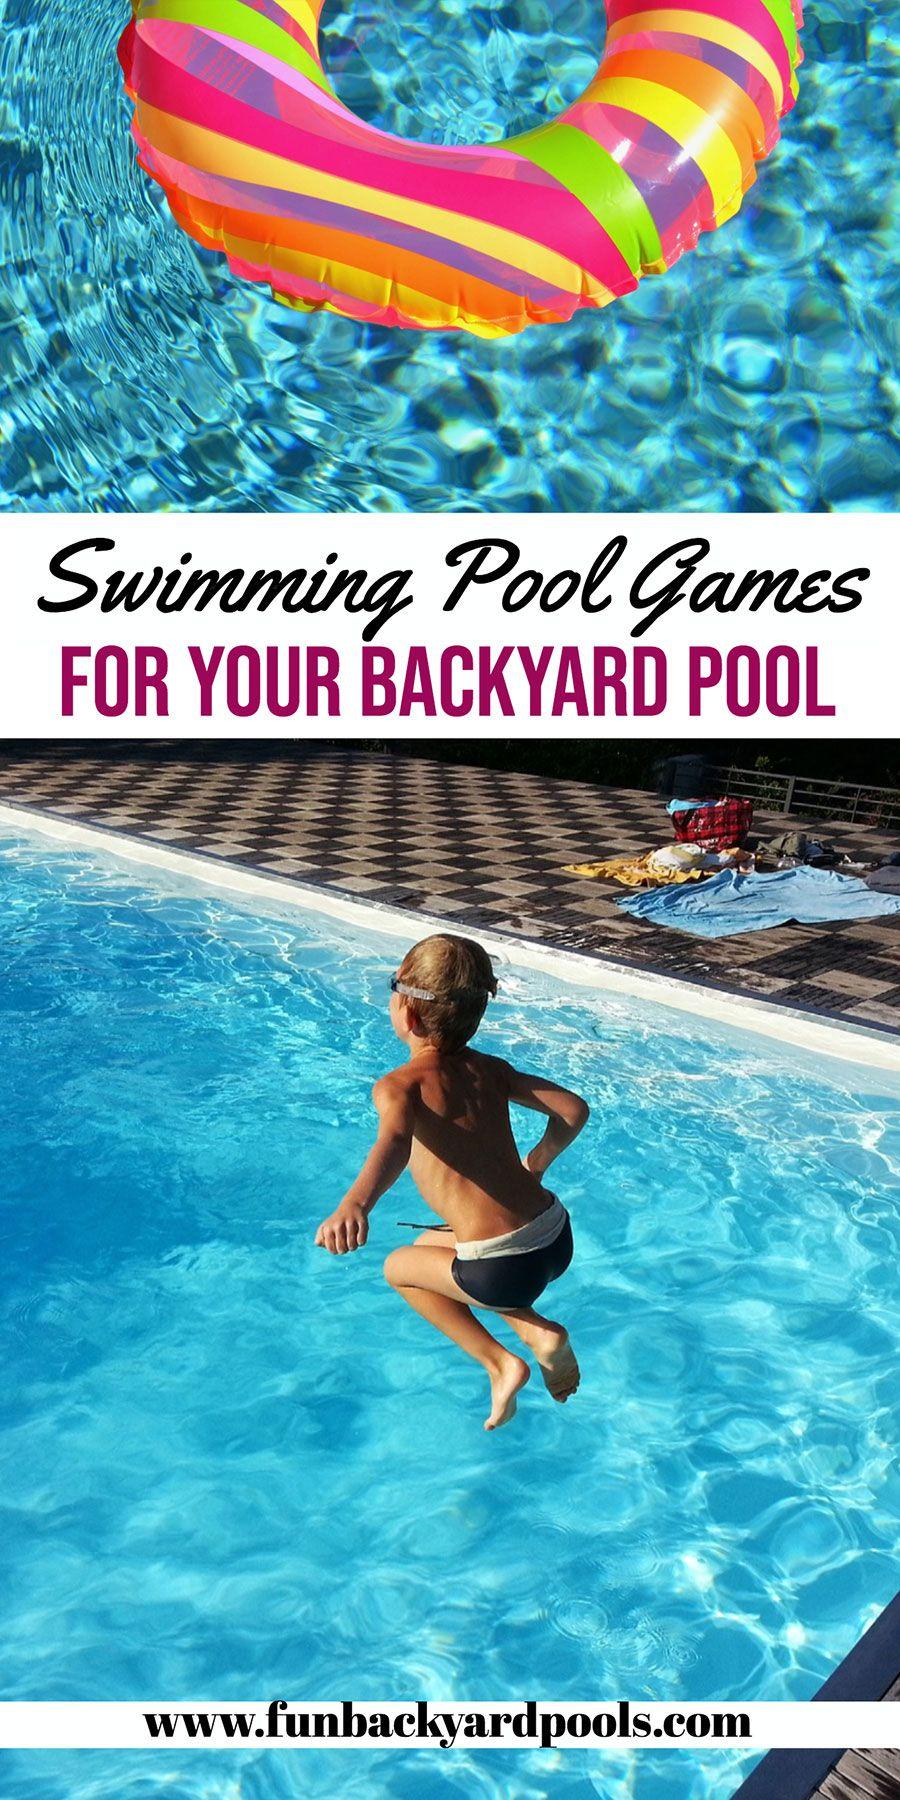 Best Swimming Pool Games For Kids Backyard Pool Games And Activities Backyard Swimming Pool Things To Do Swimming Pool Games Cool Swimming Pools Pool Games